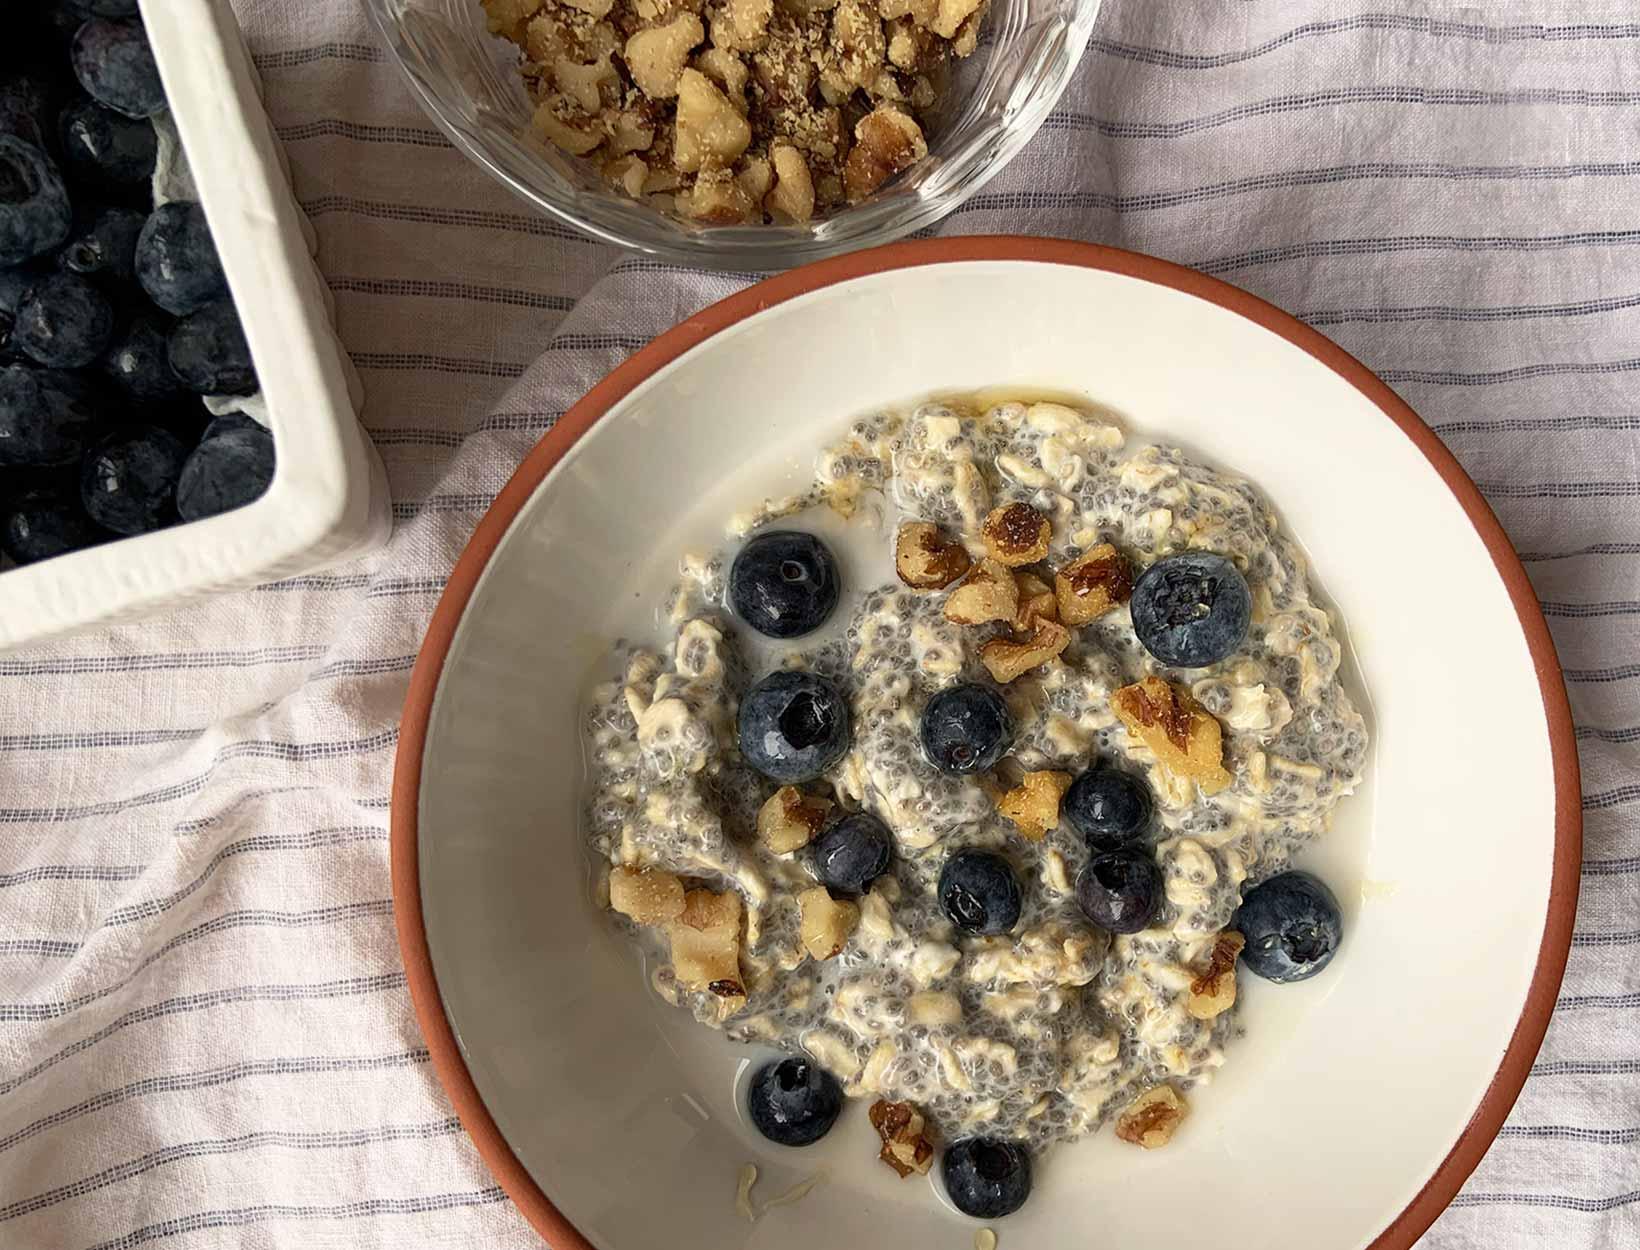 A 5-Day No-Recipe-Recipe Meal Plan